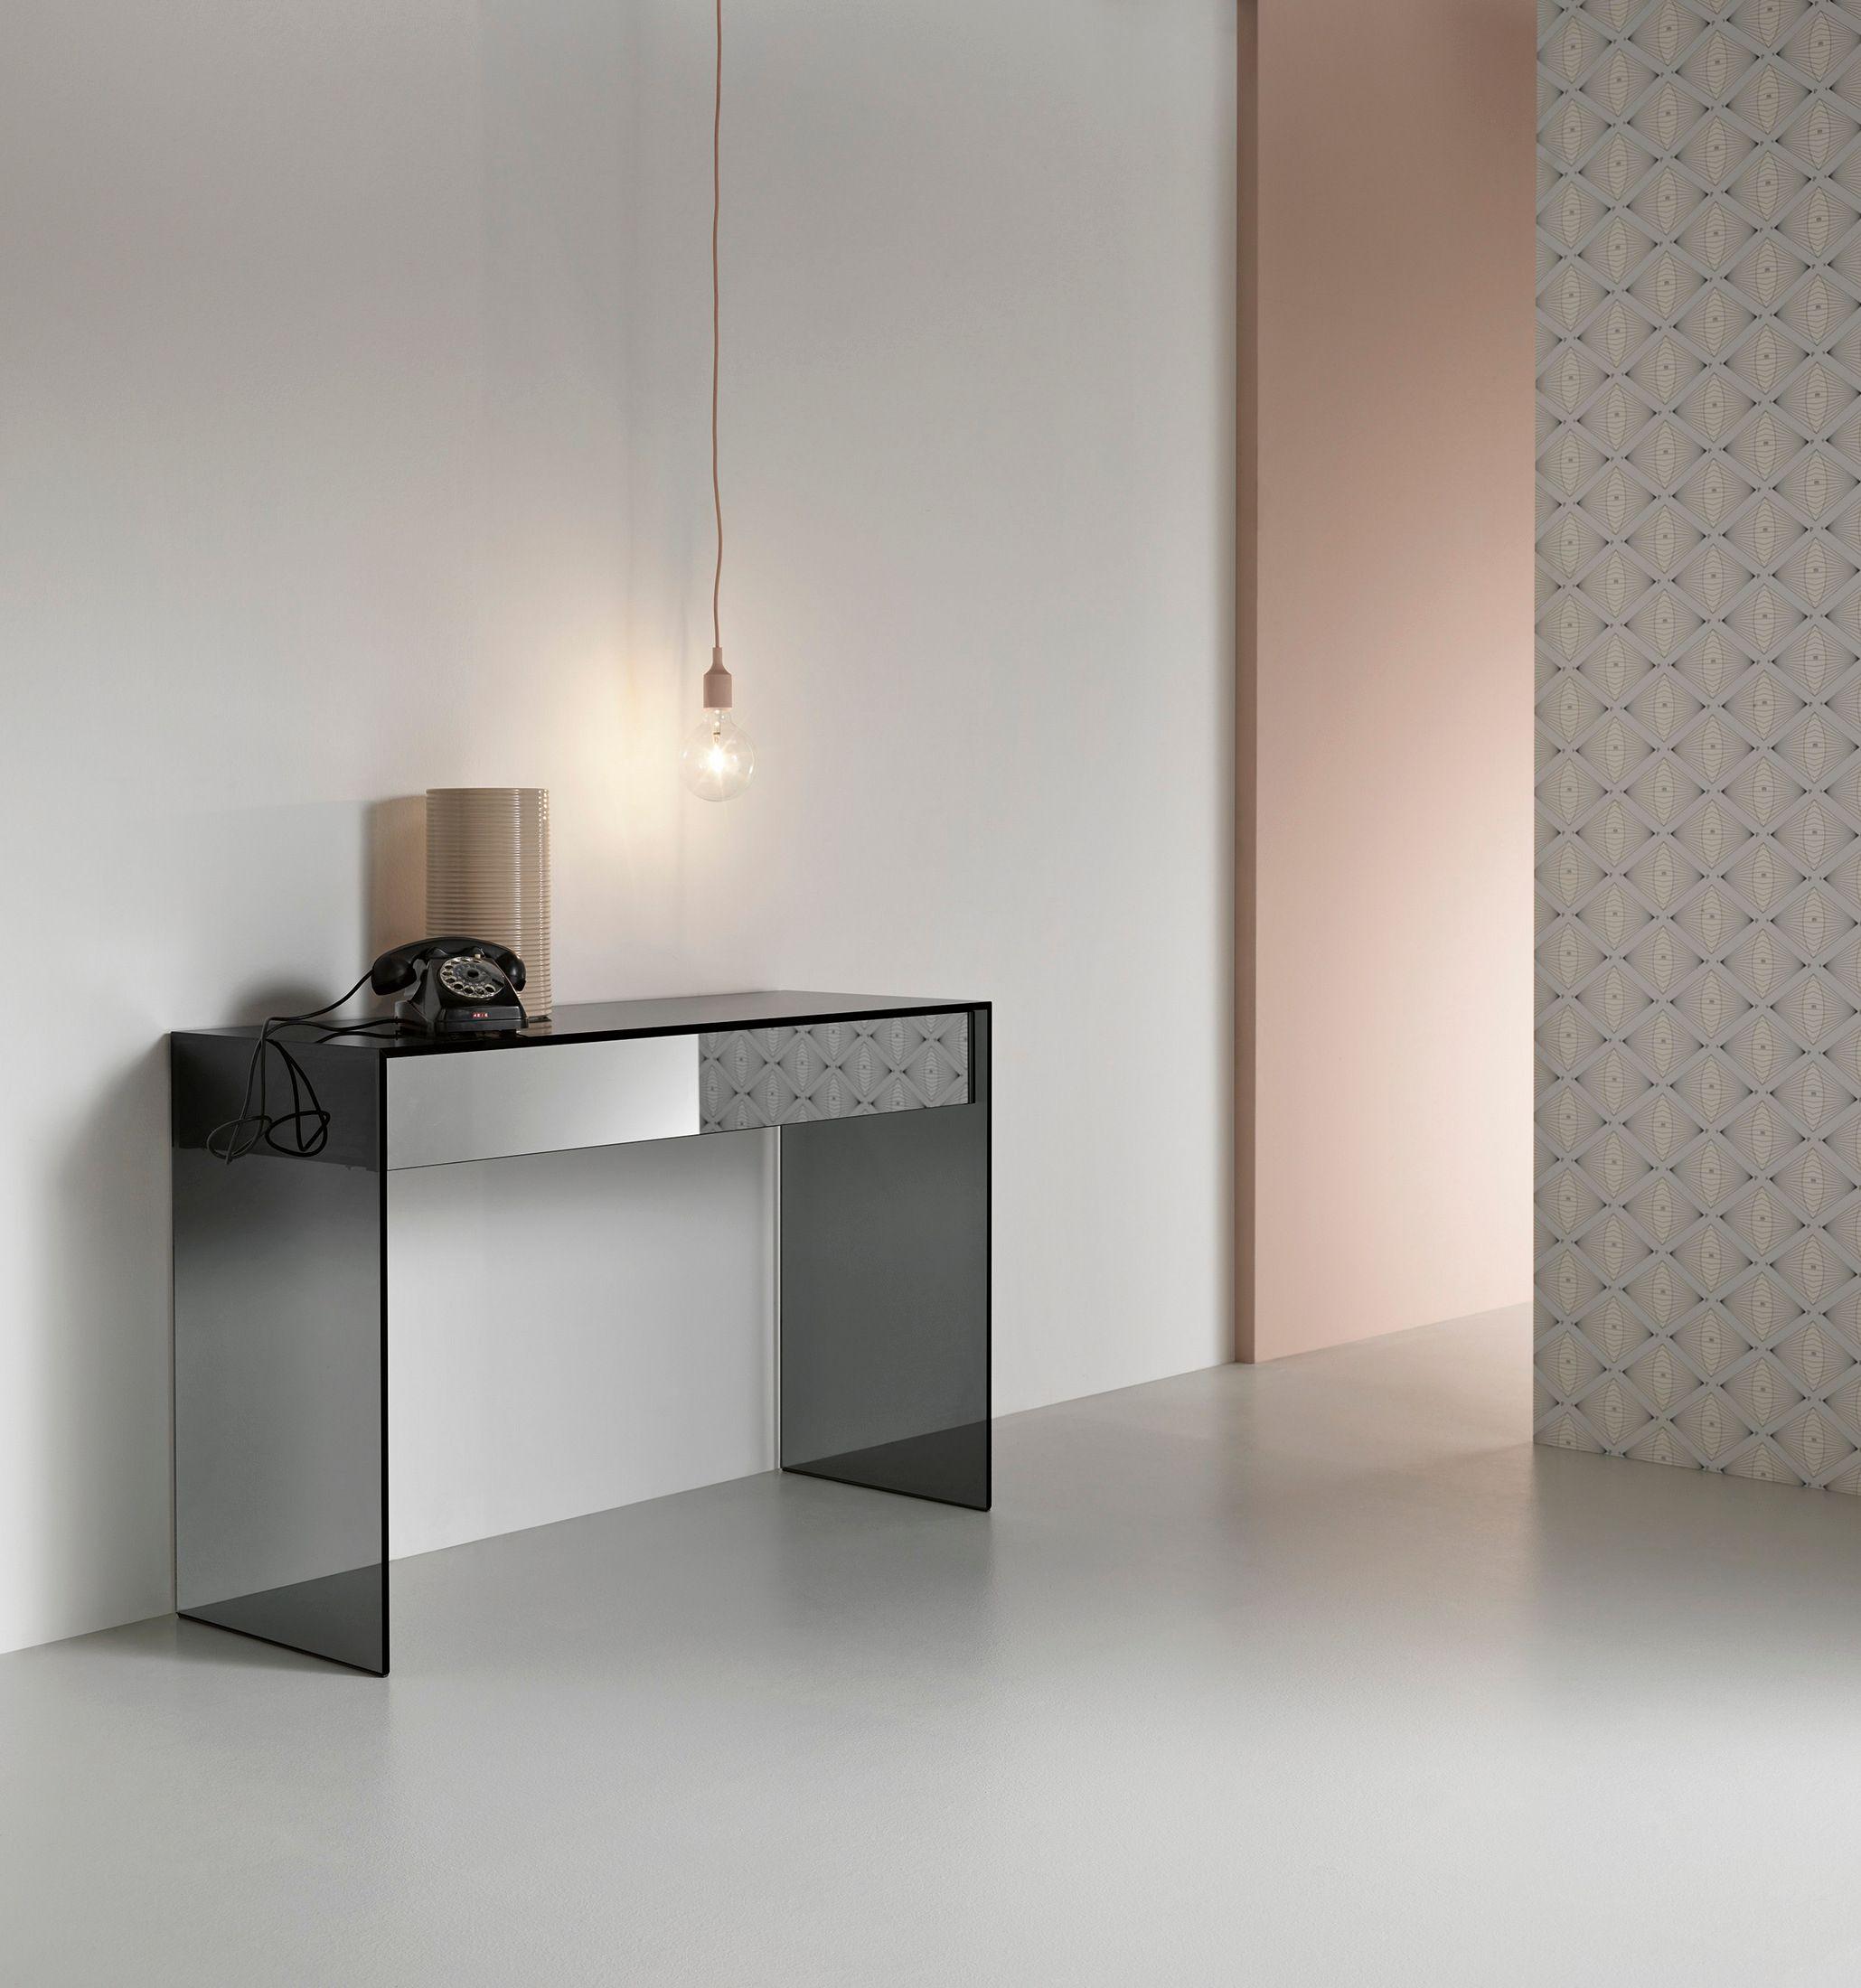 gotham konsolentisch by t d tonelli design design niko leonardi fabio marinelli. Black Bedroom Furniture Sets. Home Design Ideas